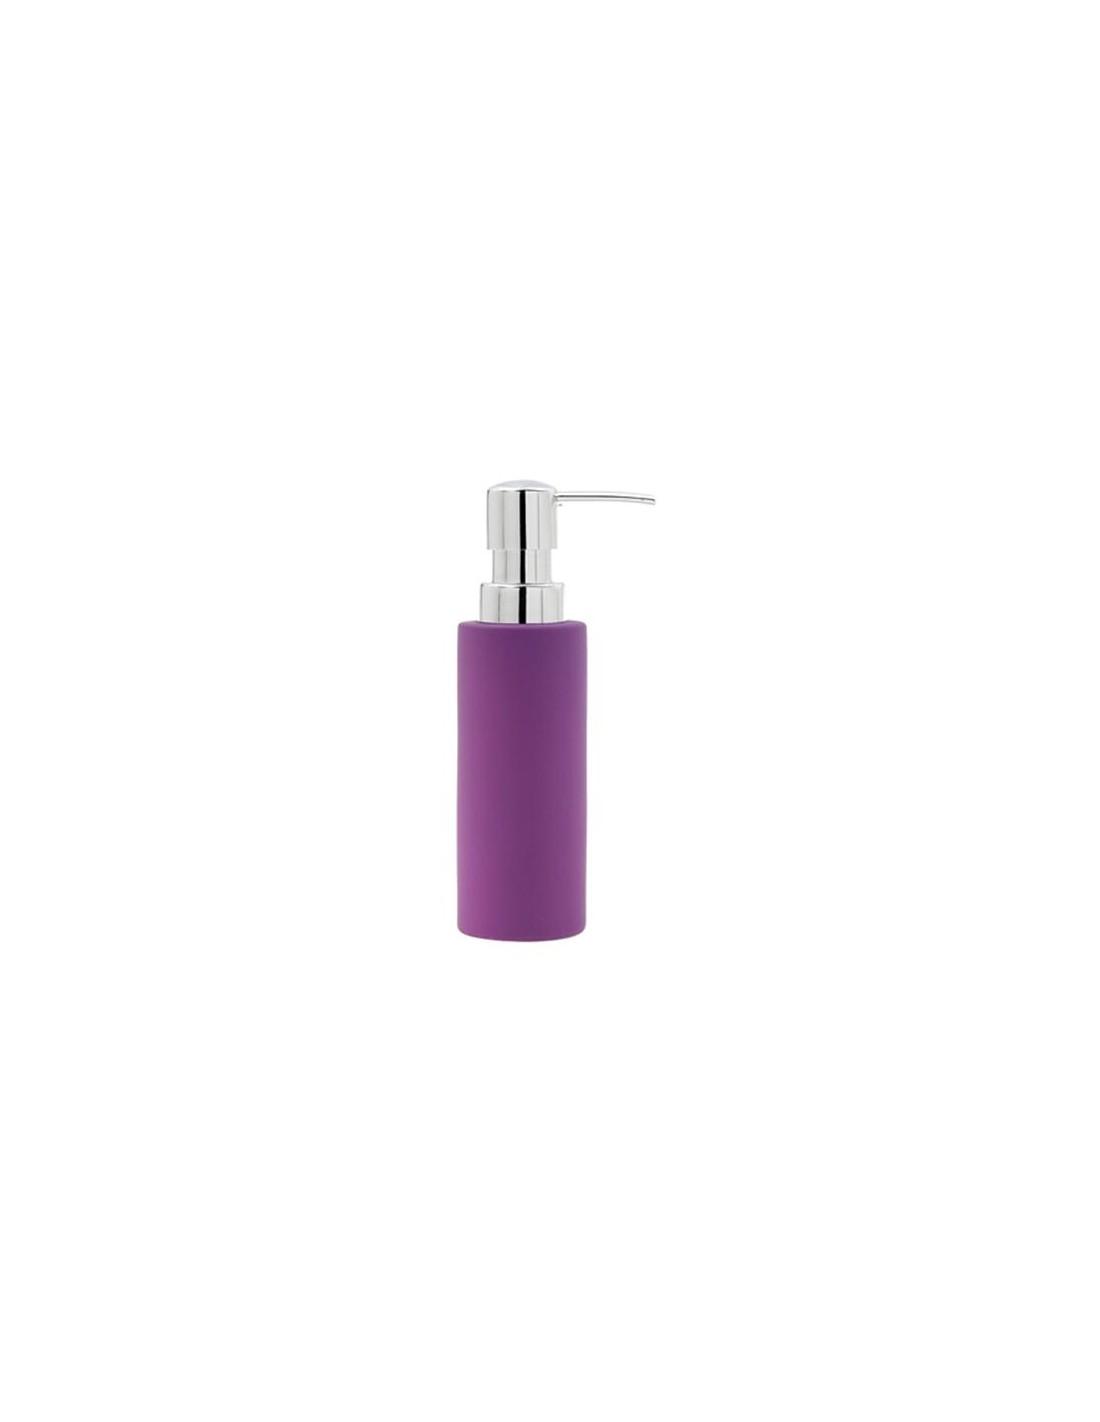 distributeur de savon liquide confetti bath violet de la marque zone. Black Bedroom Furniture Sets. Home Design Ideas